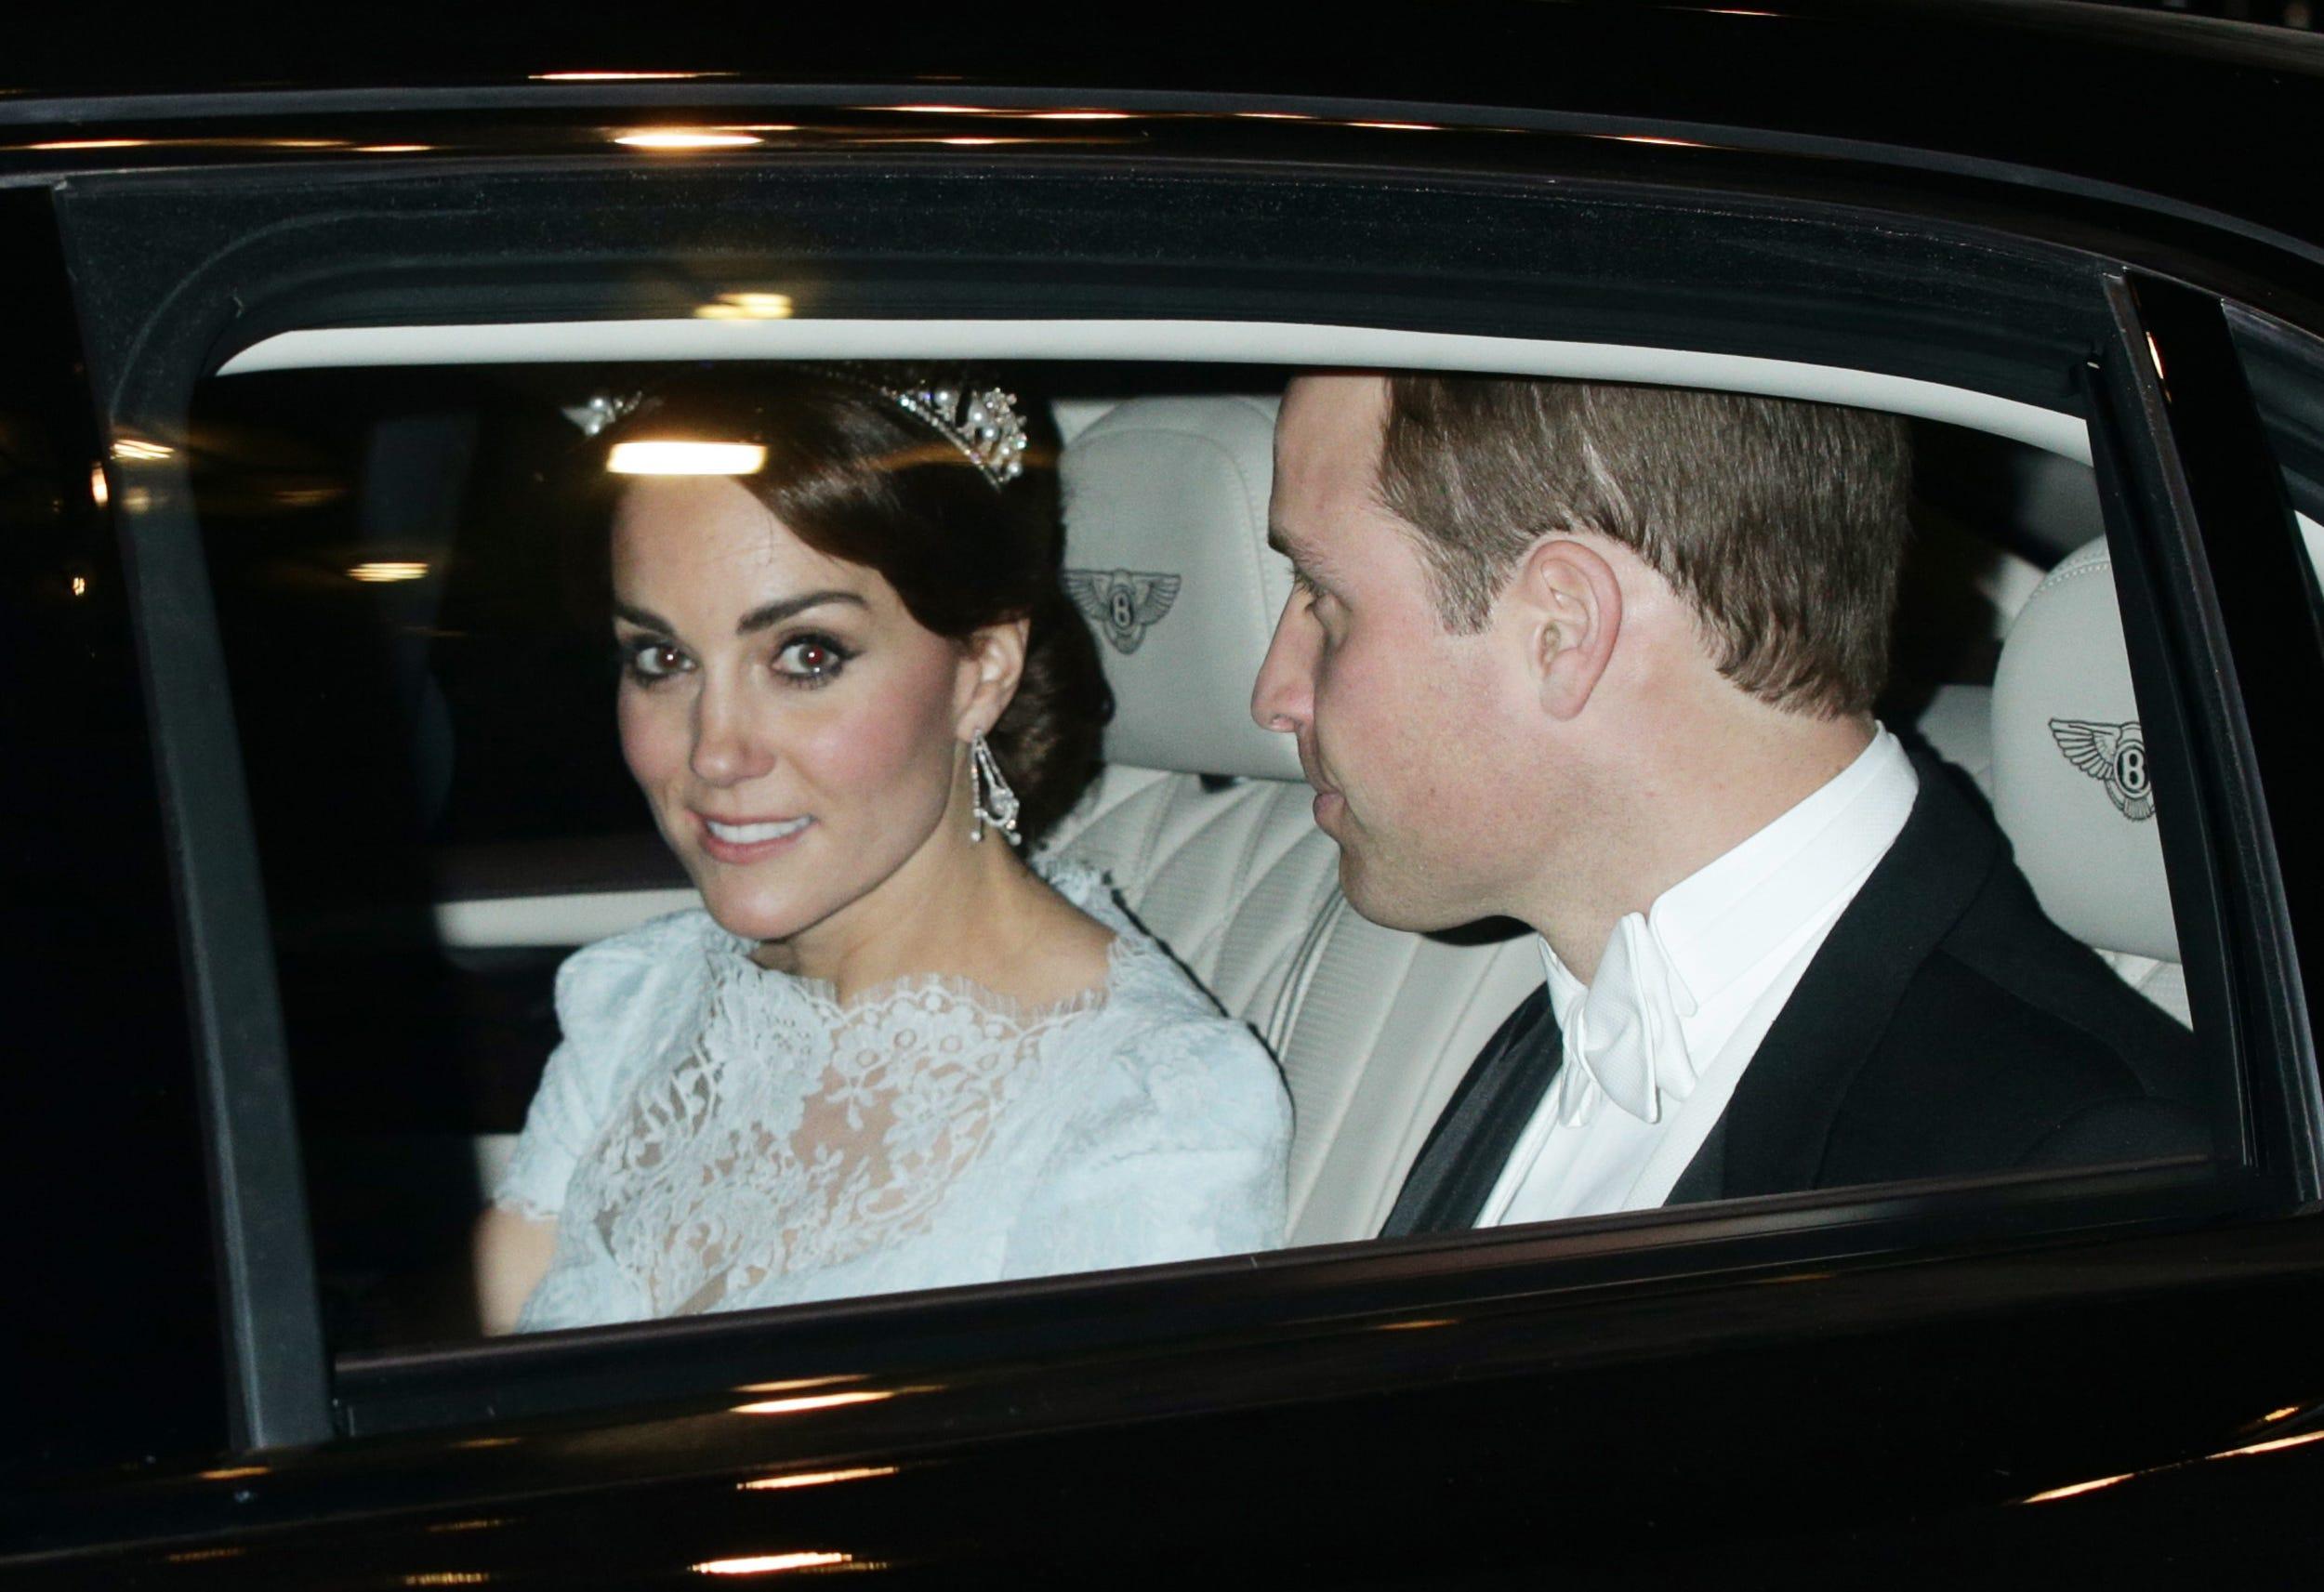 Princess Dianas Cambridge tiara looks perfect on Duchess of Cambridge